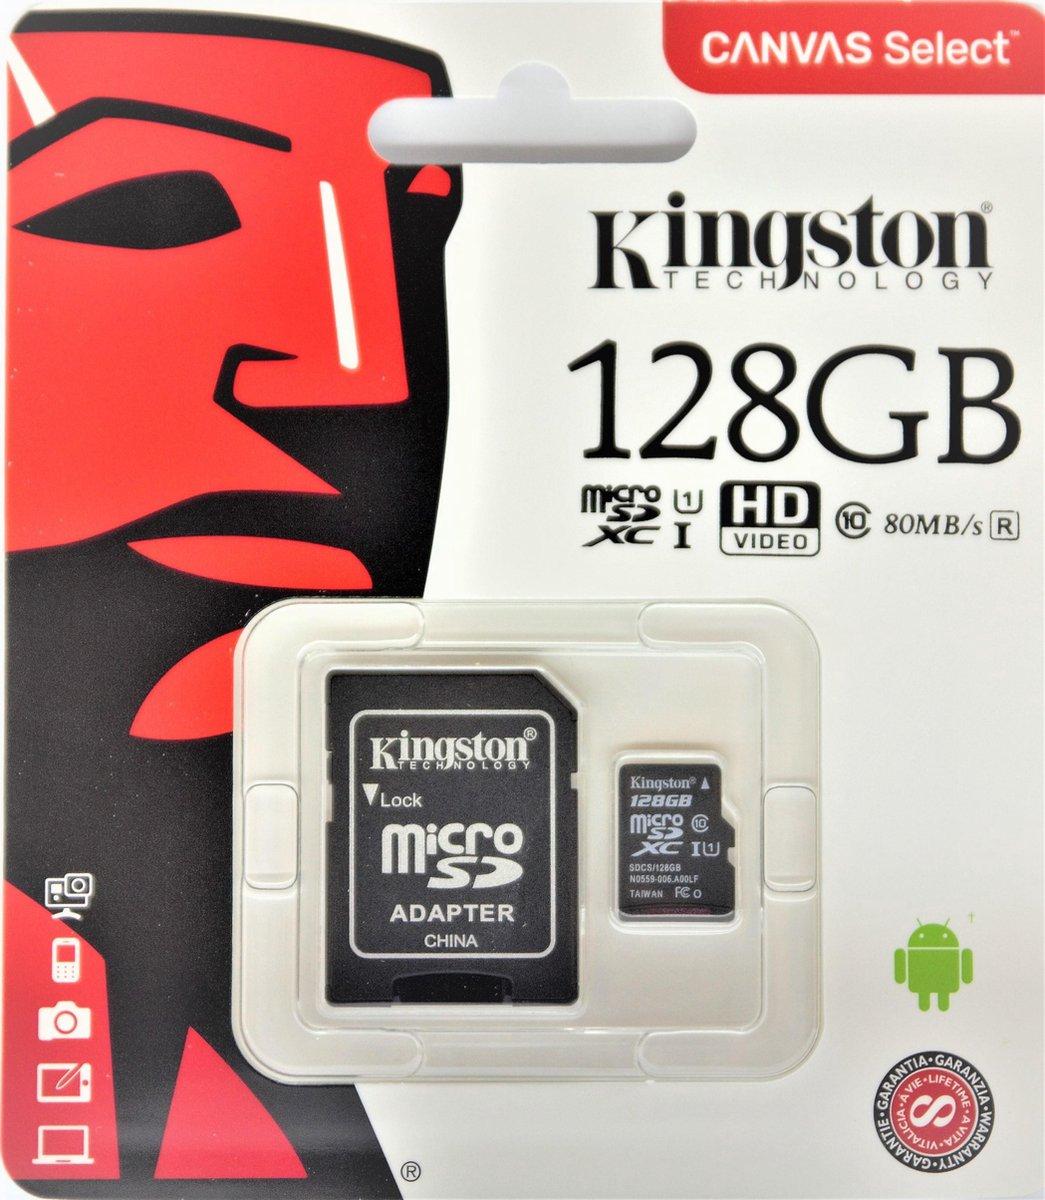 Kingston Micro SD kaart Canvas 128 GB + SD Adapter (HD video- 80MB/S/R)